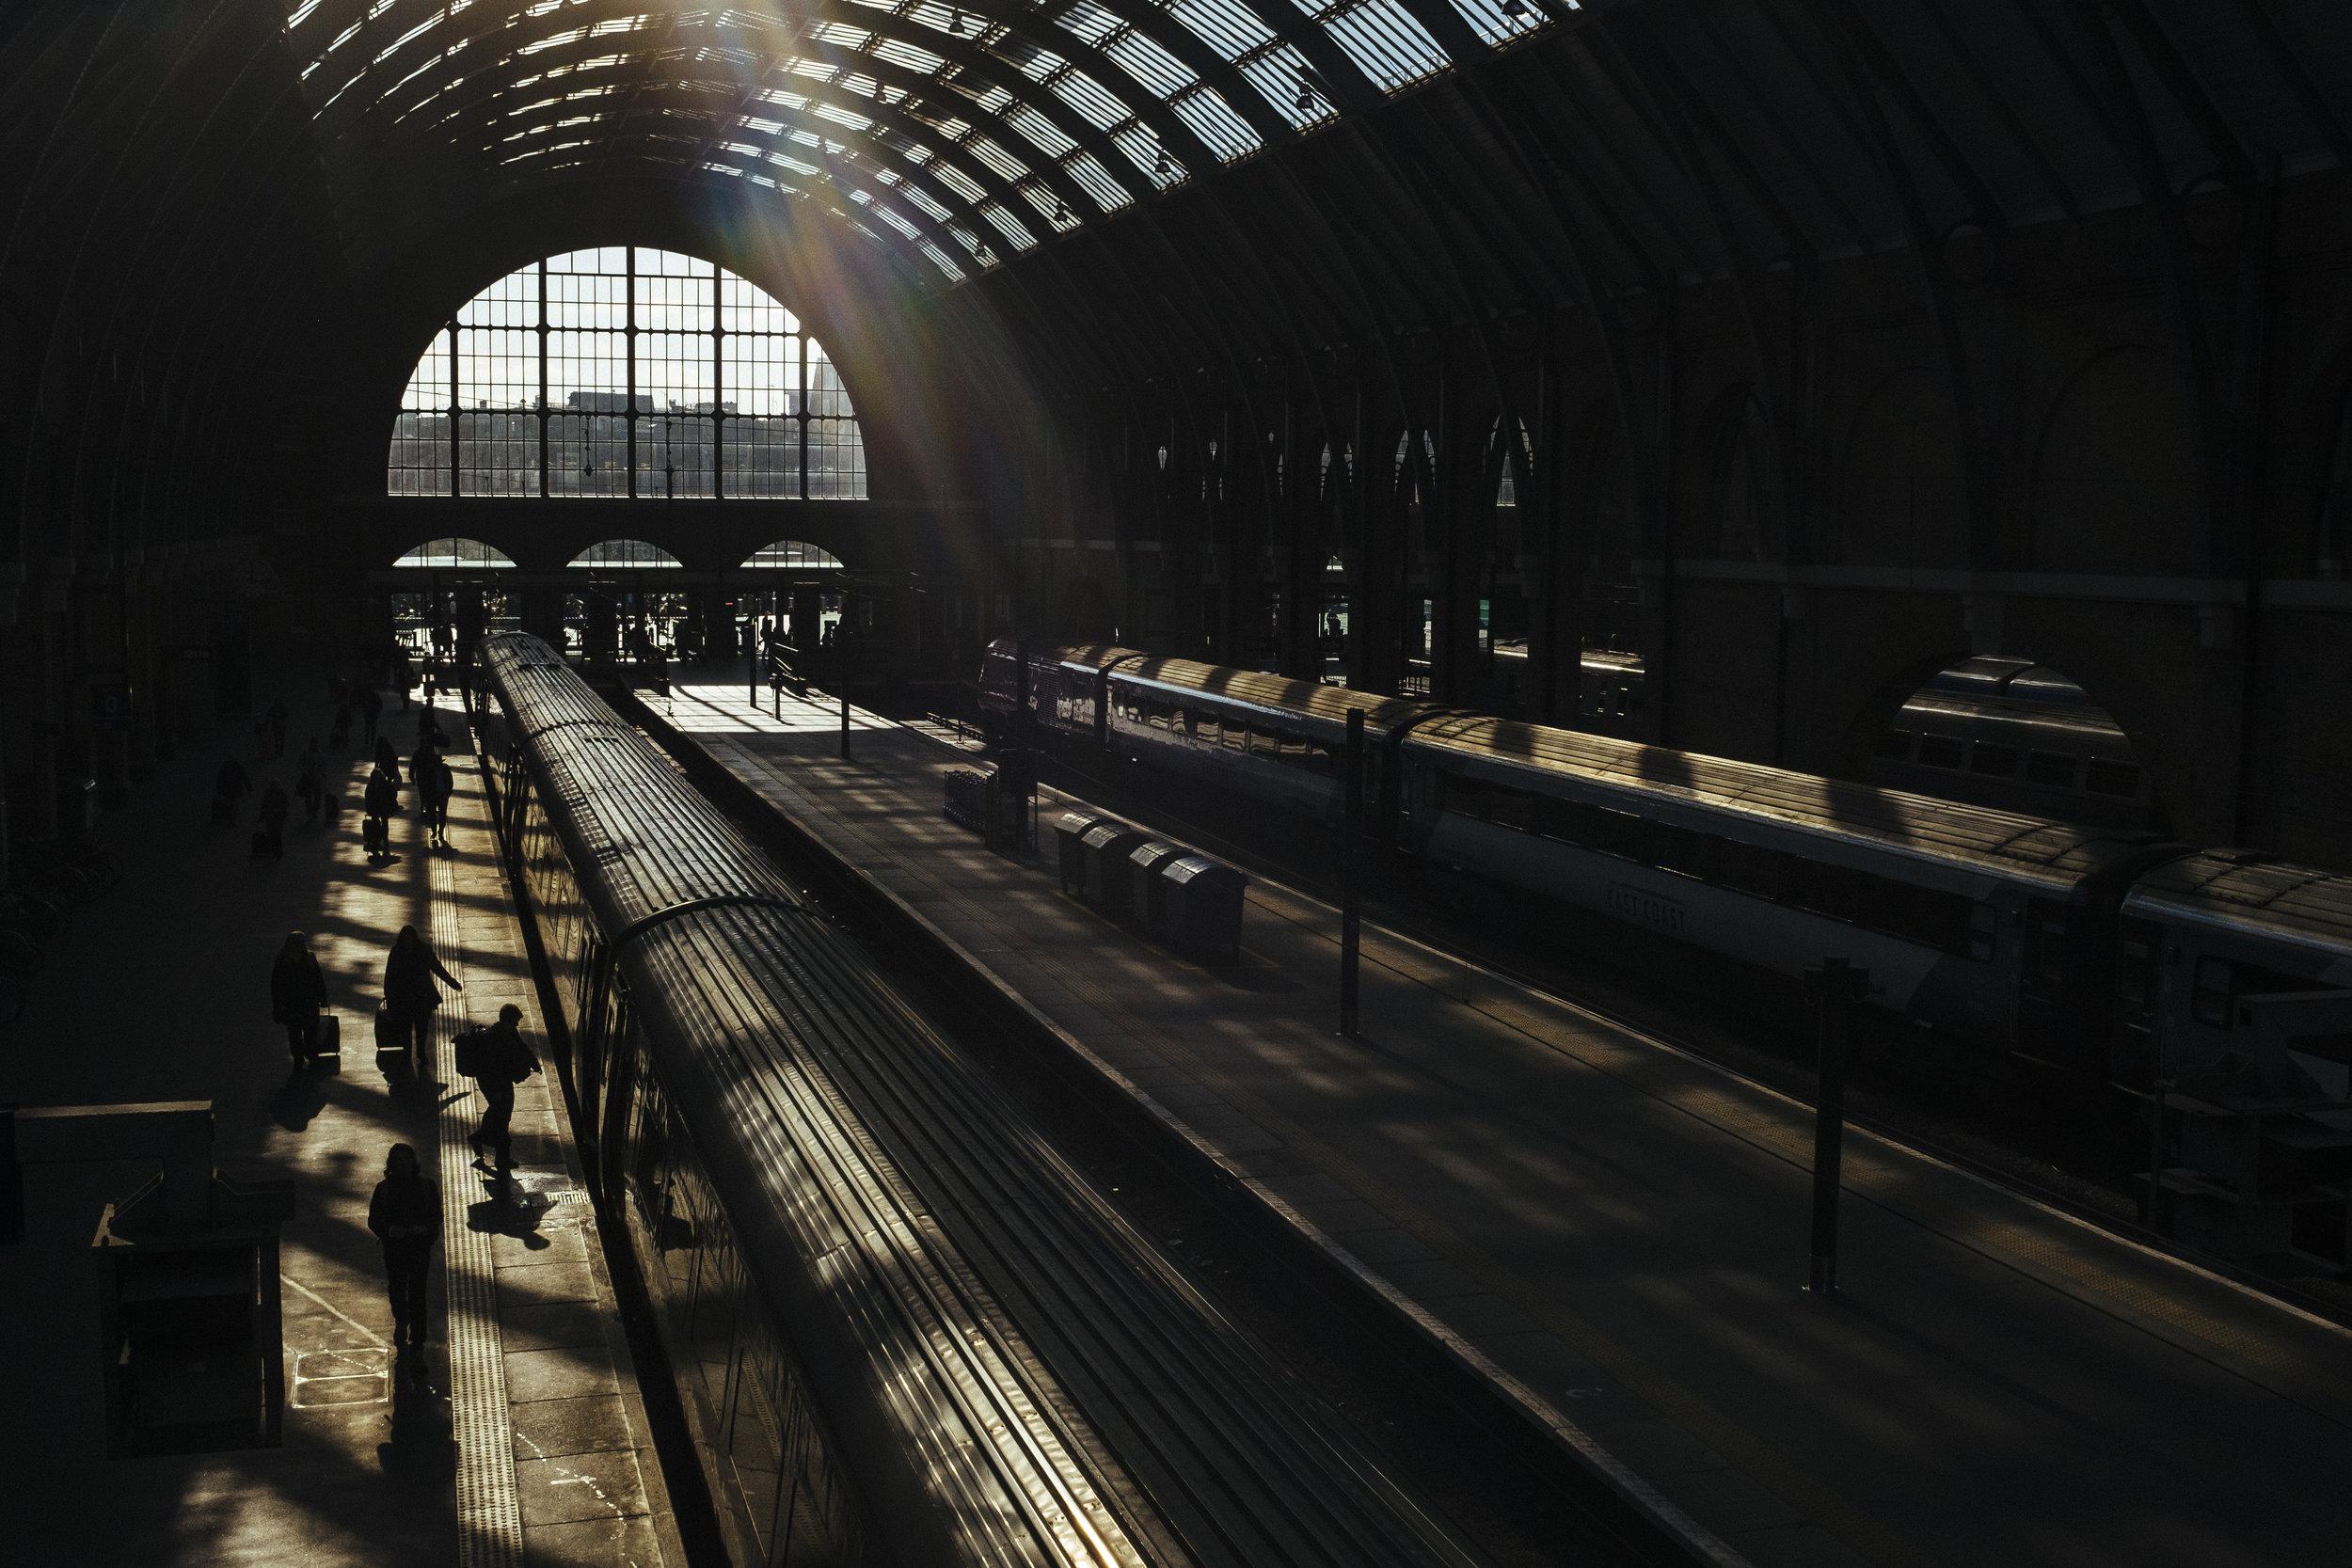 Passengers walk alongside a waiting train at a platform at King's Cross railway station, London, Wednesday, Feb. 18, 2015.